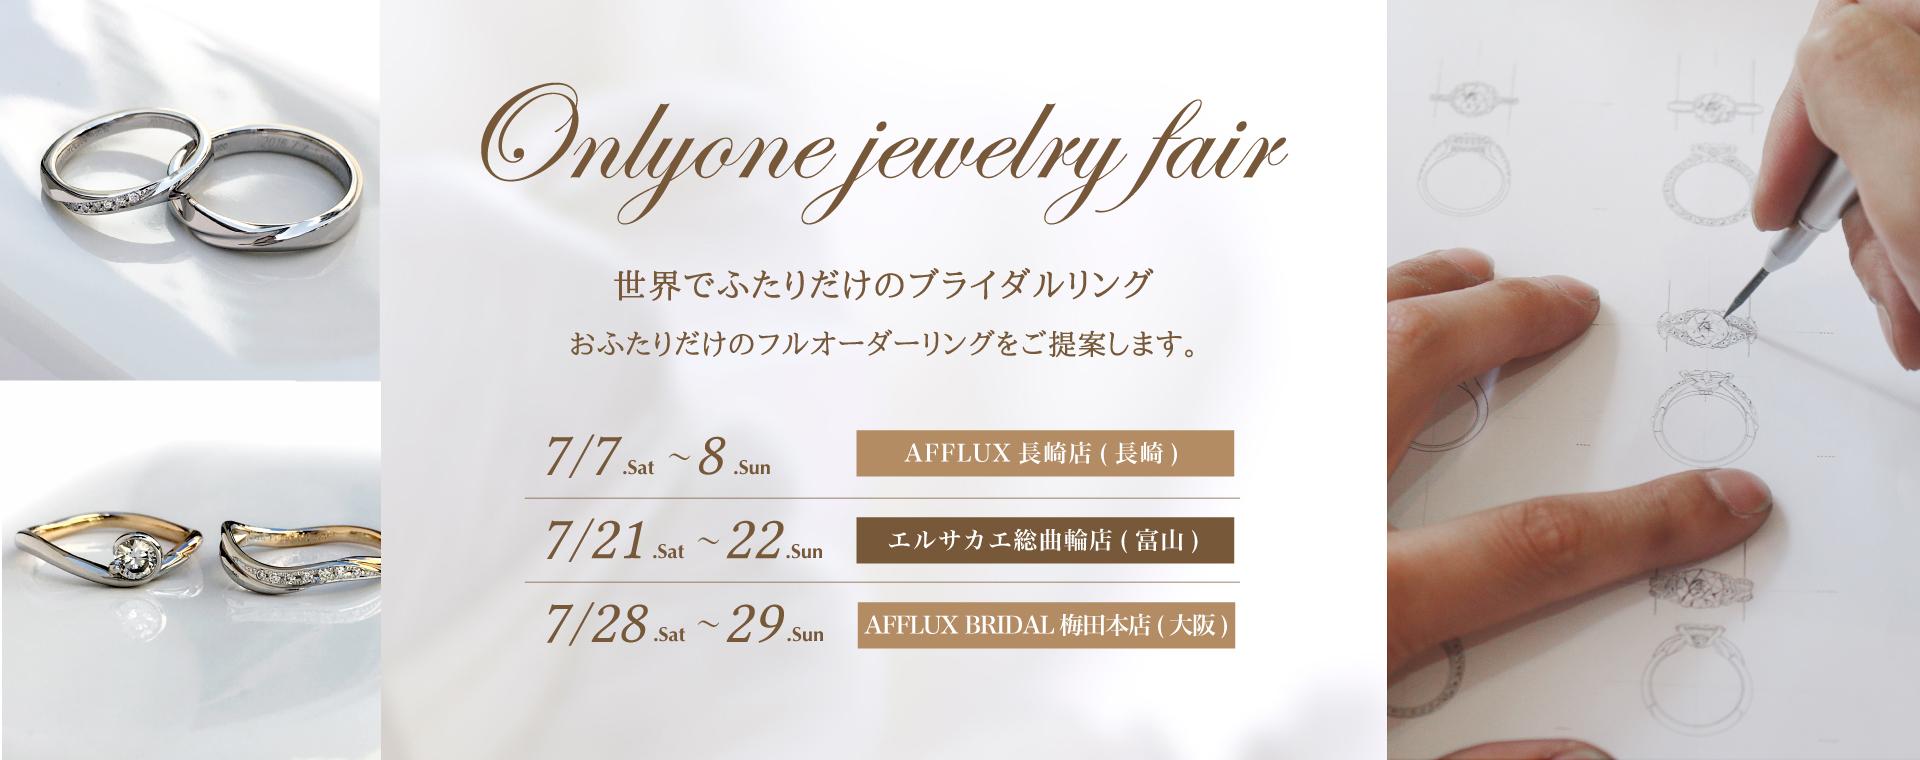 Onlyone jewelry fair